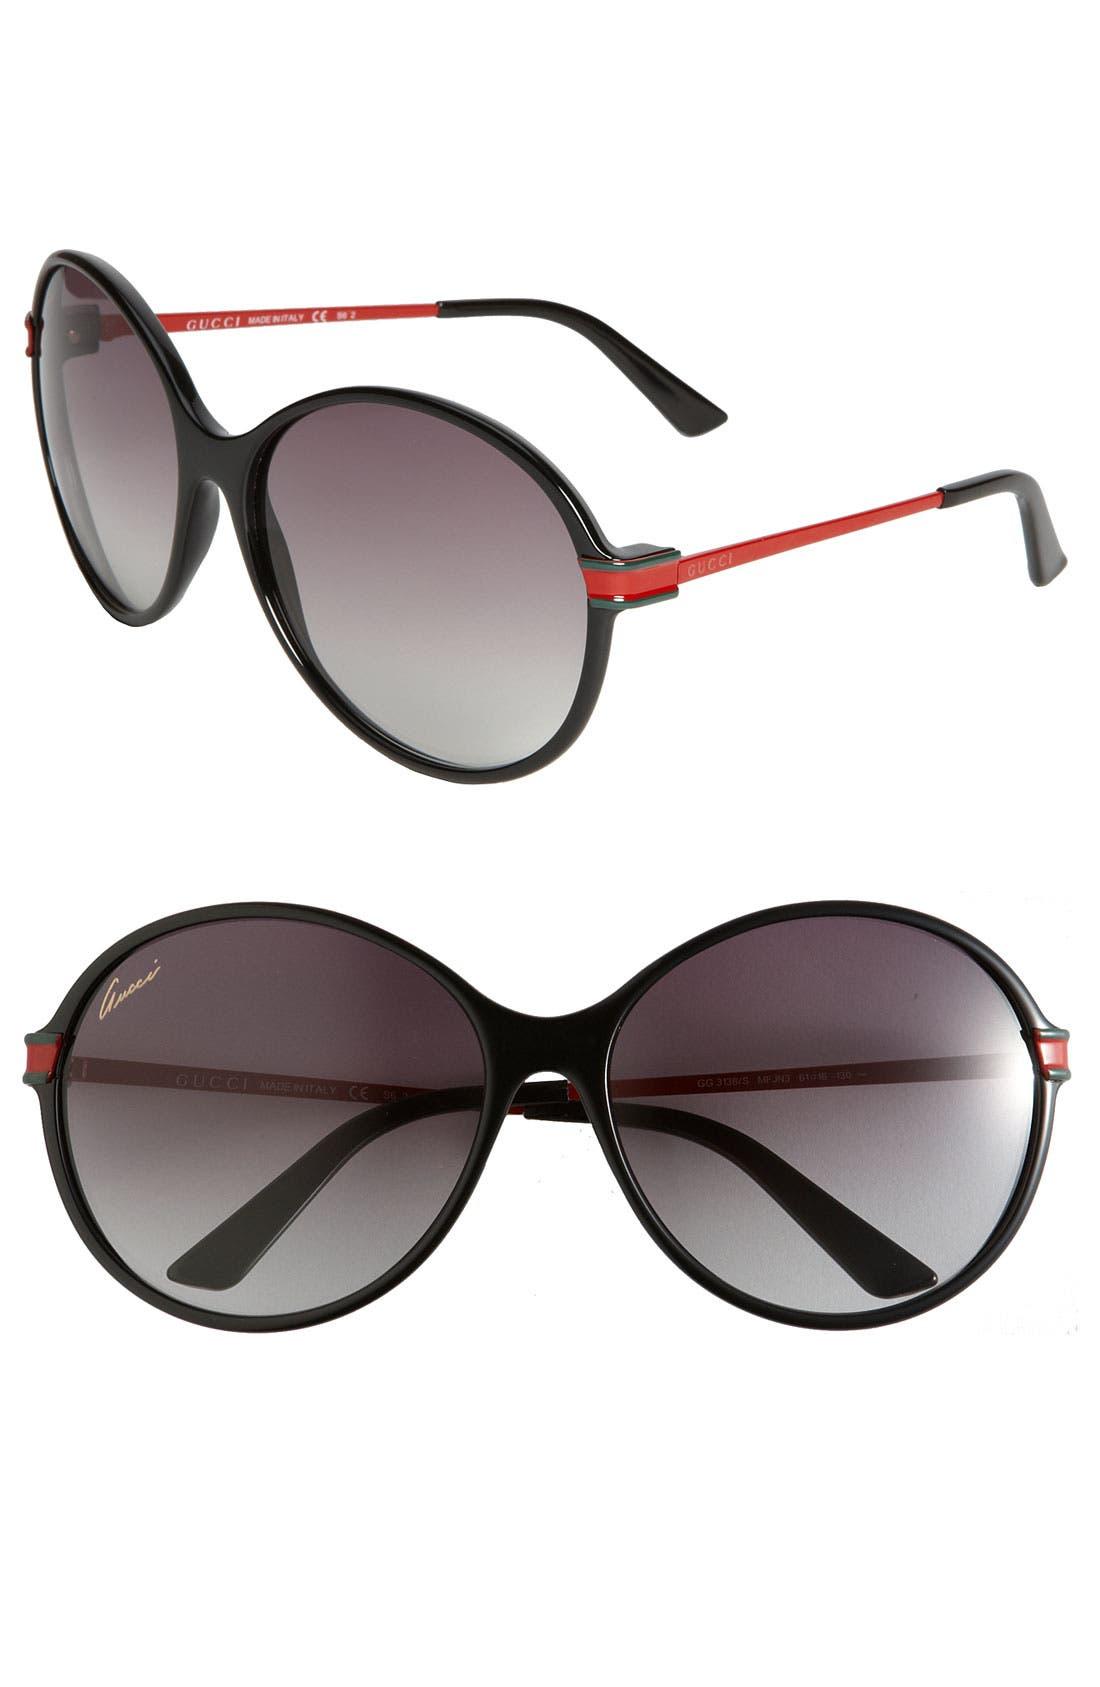 Main Image - Gucci Oversized Round Frame Sunglasses